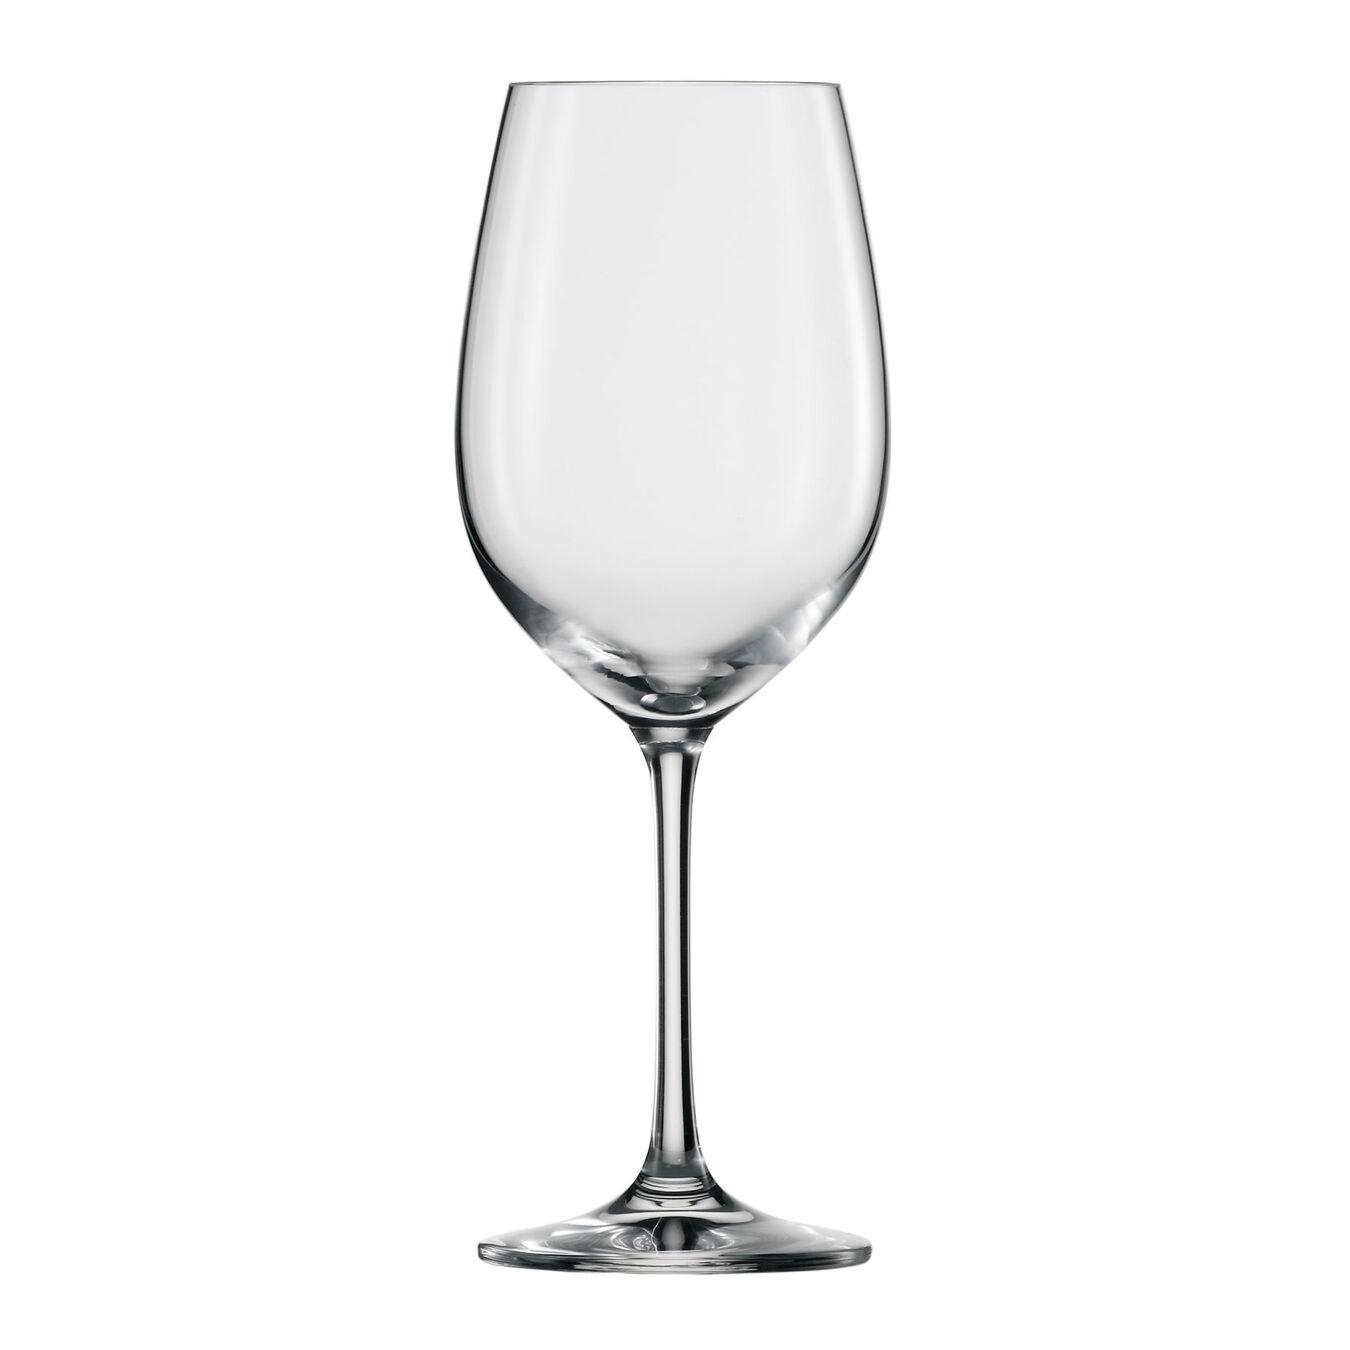 Taça para vinho branco 350 ml,,large 1